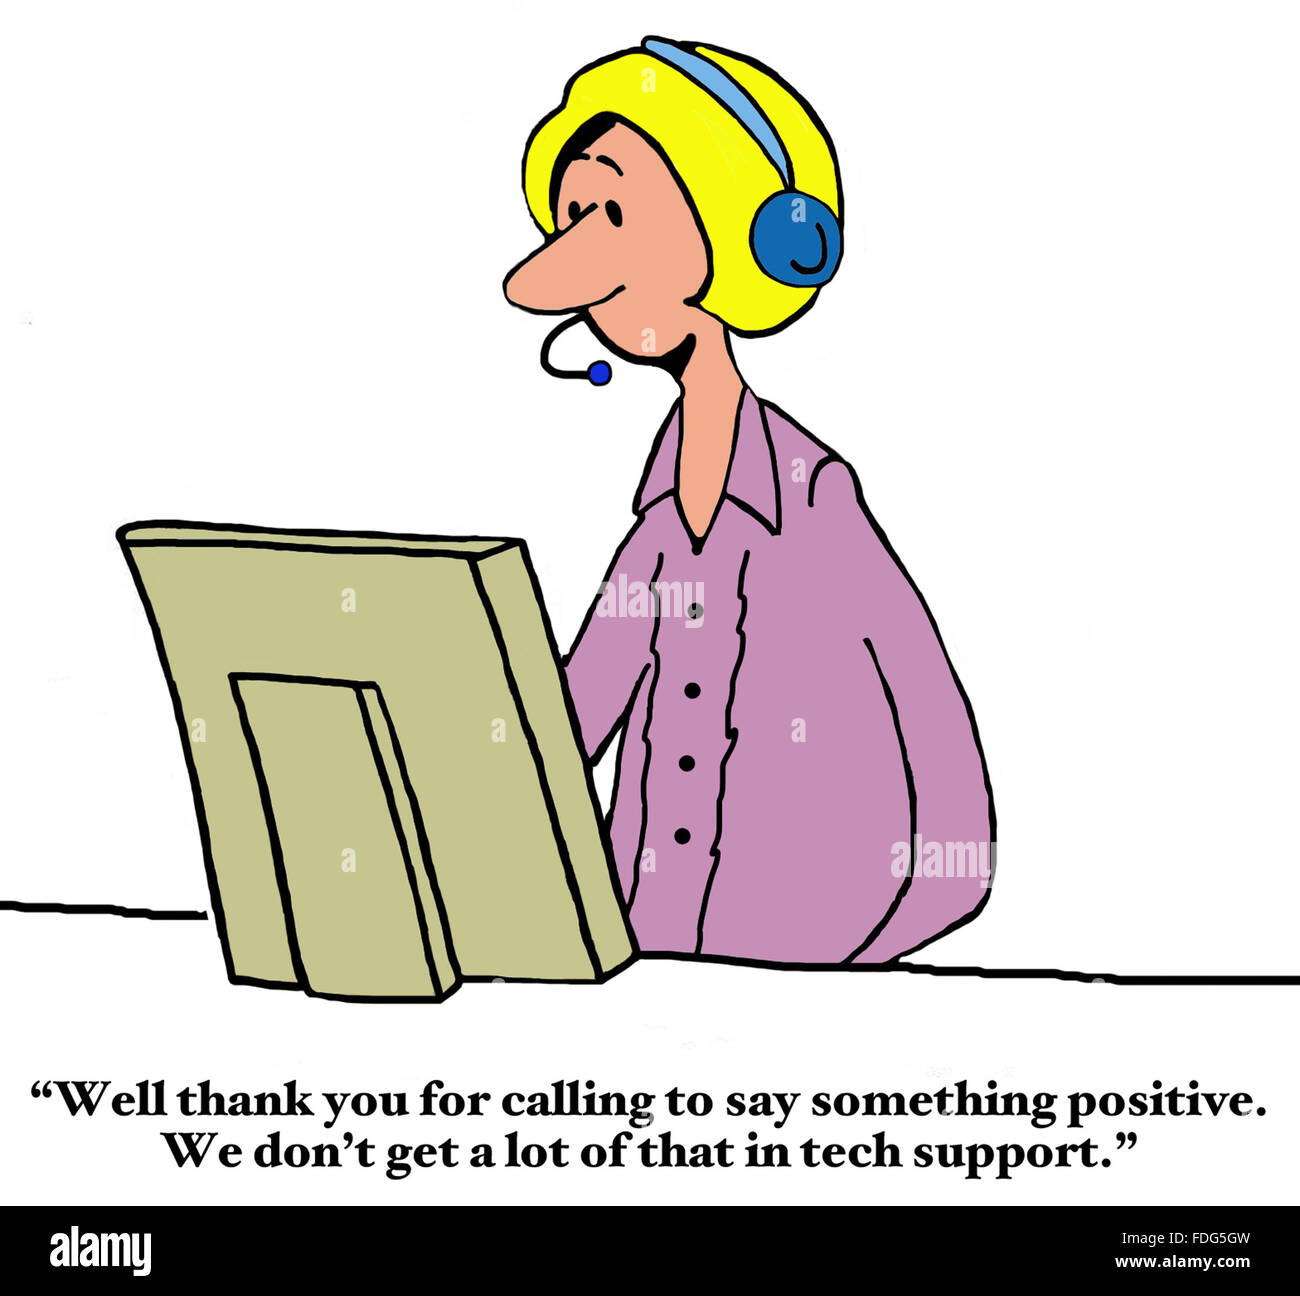 customer service cartoon tech support stock photos customer